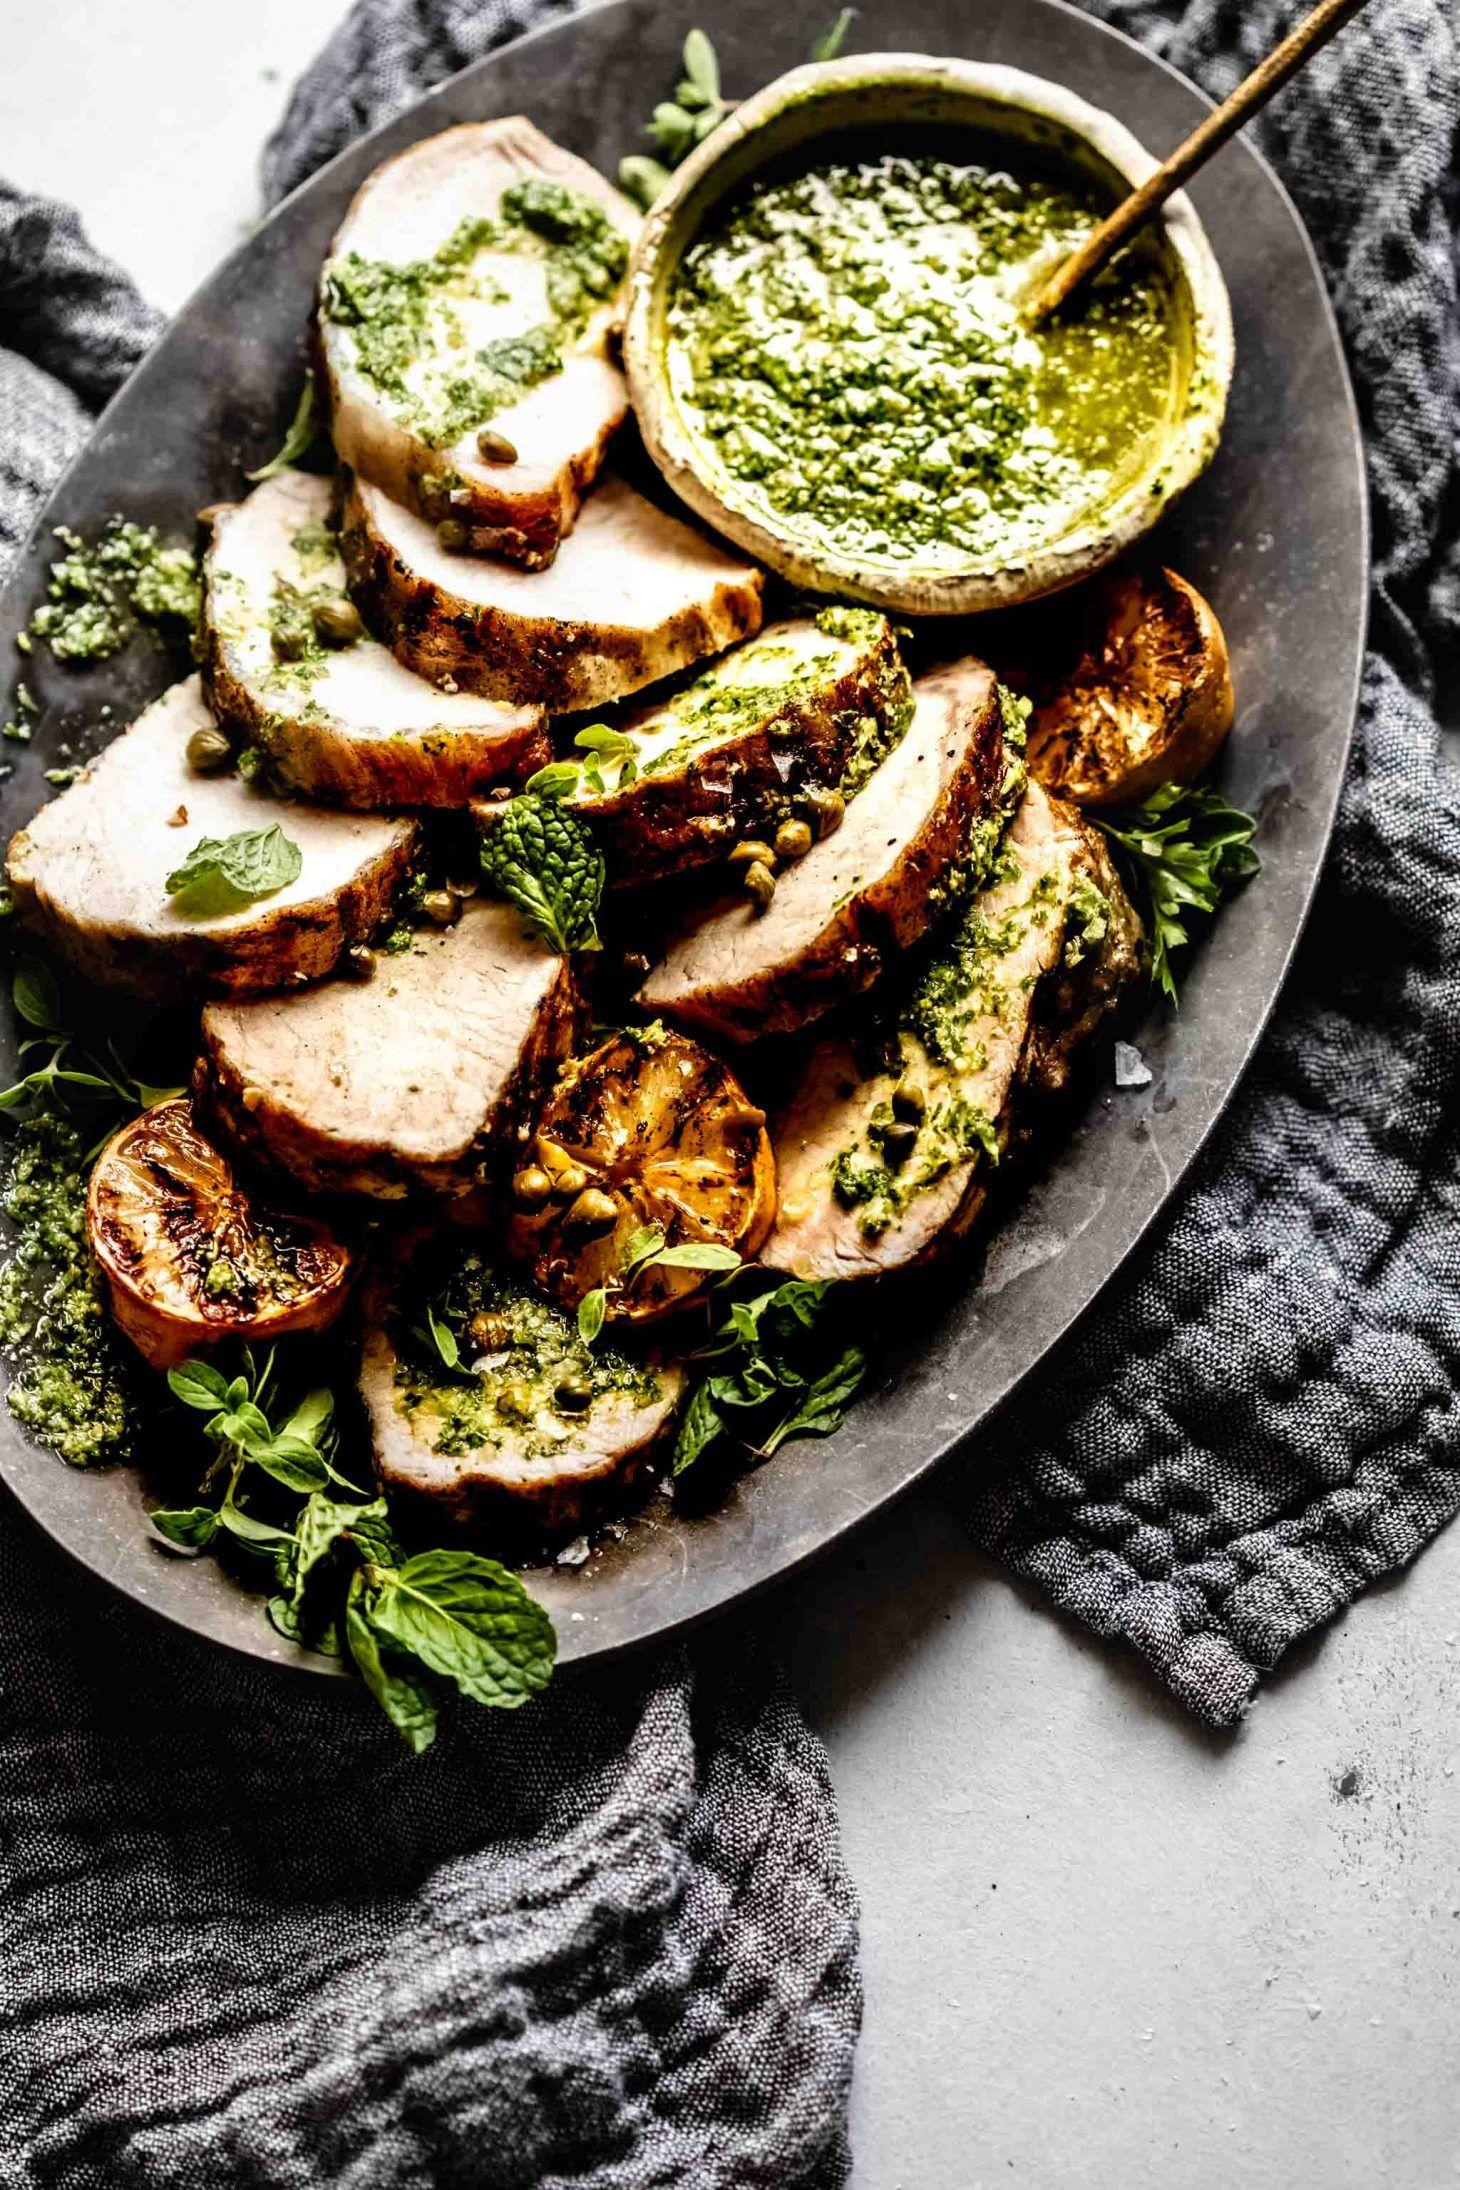 Grilled pork tenderloin with charred lemon chimichurri is